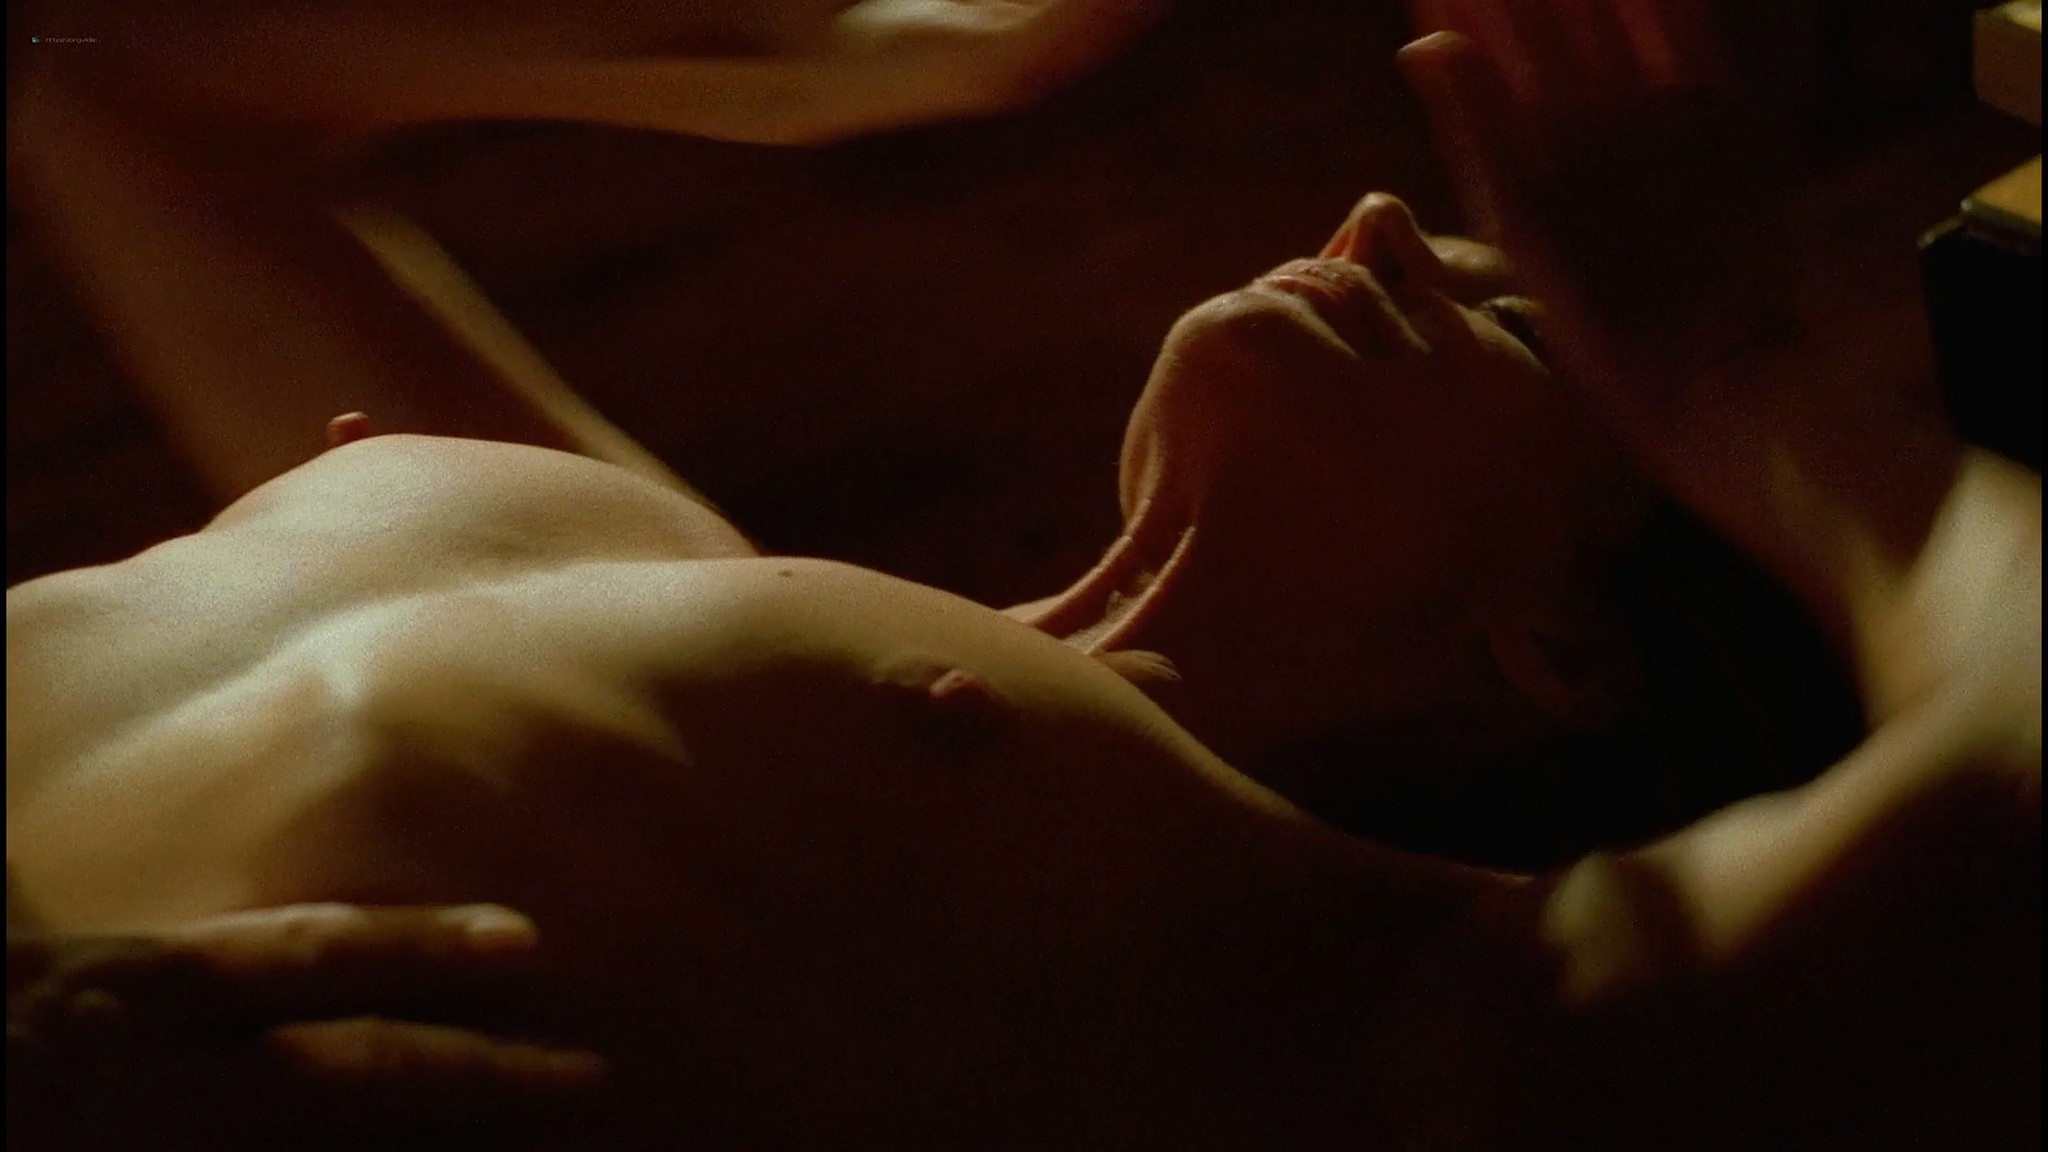 Serena Scott Thomas nude sex Sarah Lassez and others nude too Brothel 2008 1080p Web